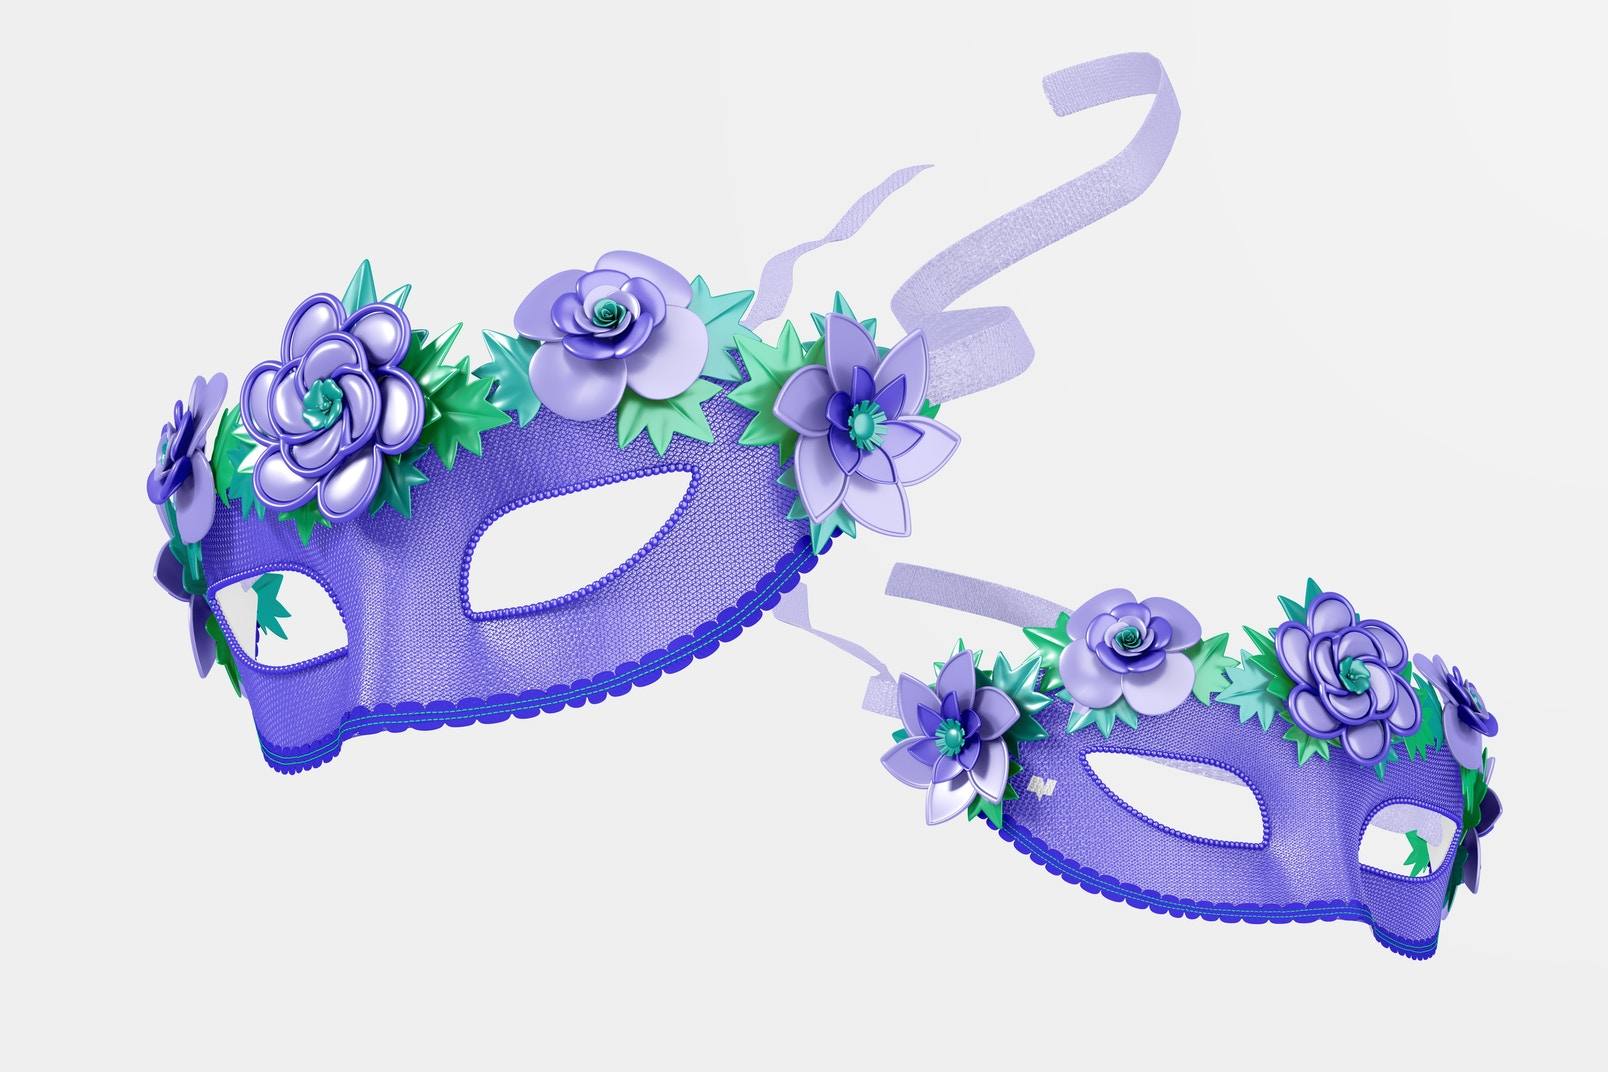 Floral Venetian Half-Face Masks Mockup, Falling